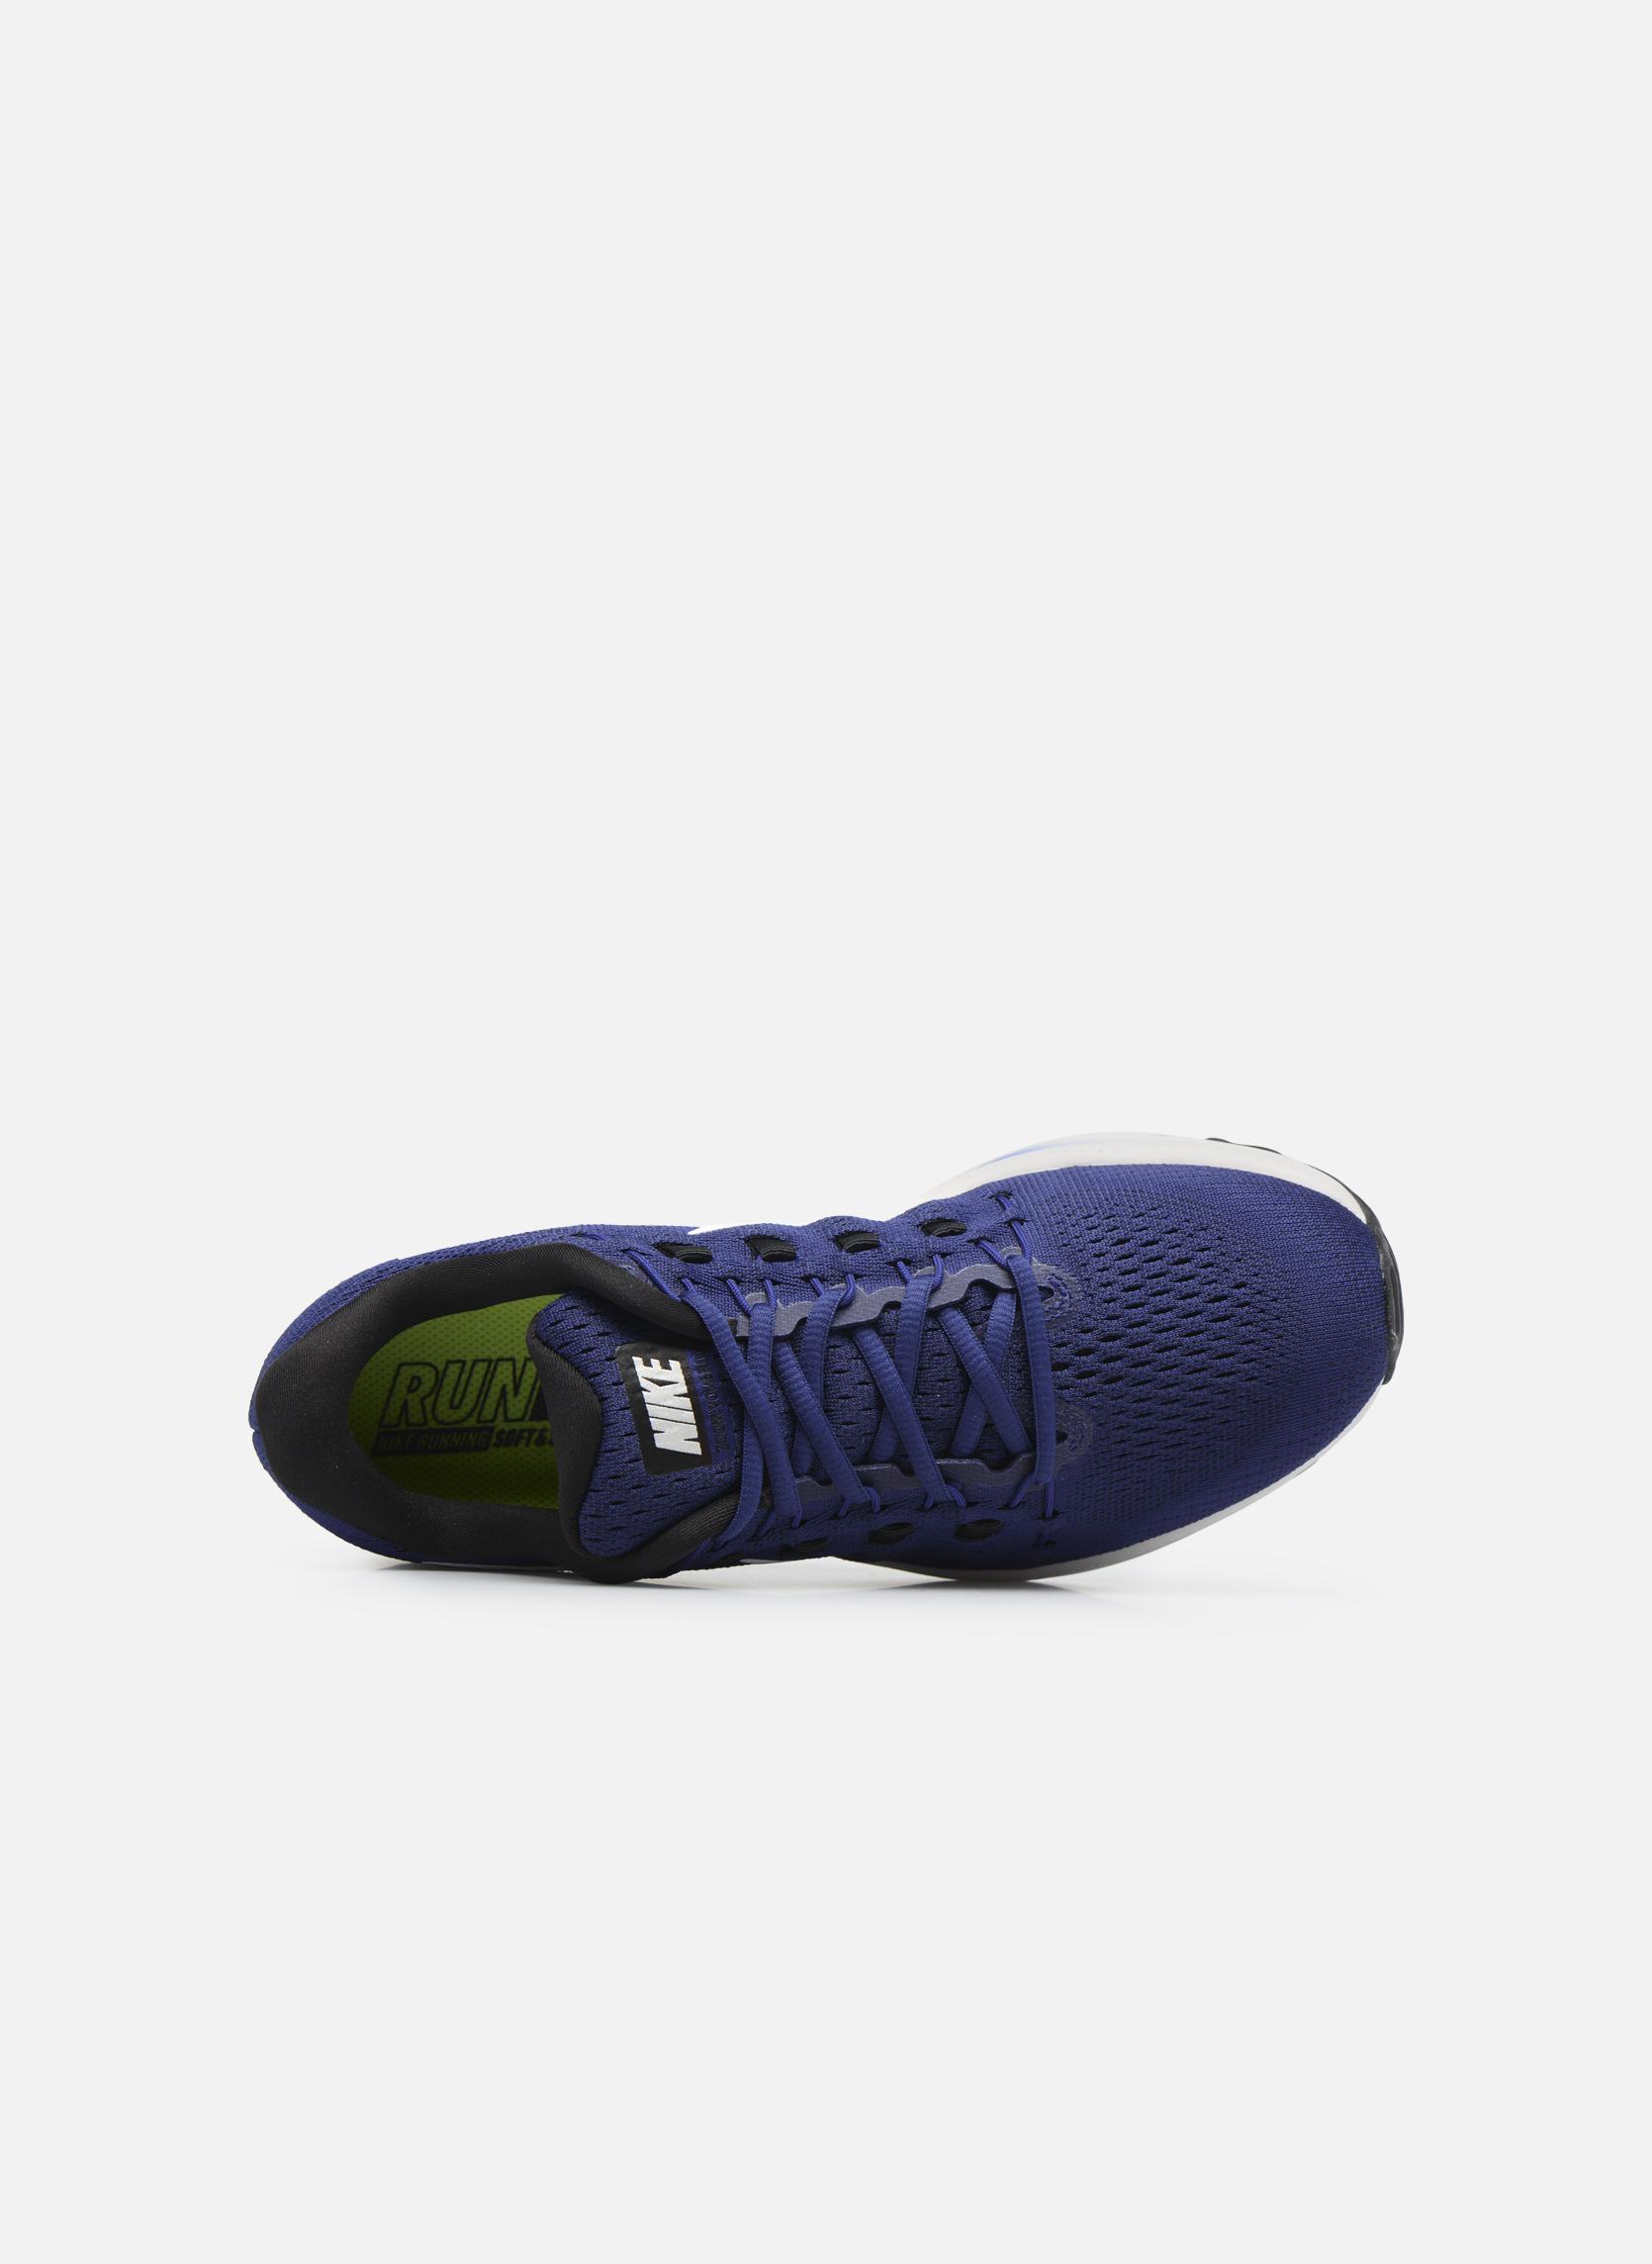 Nike Air Zoom Vomero 12 Deep Royal Blue/Summit White-Black